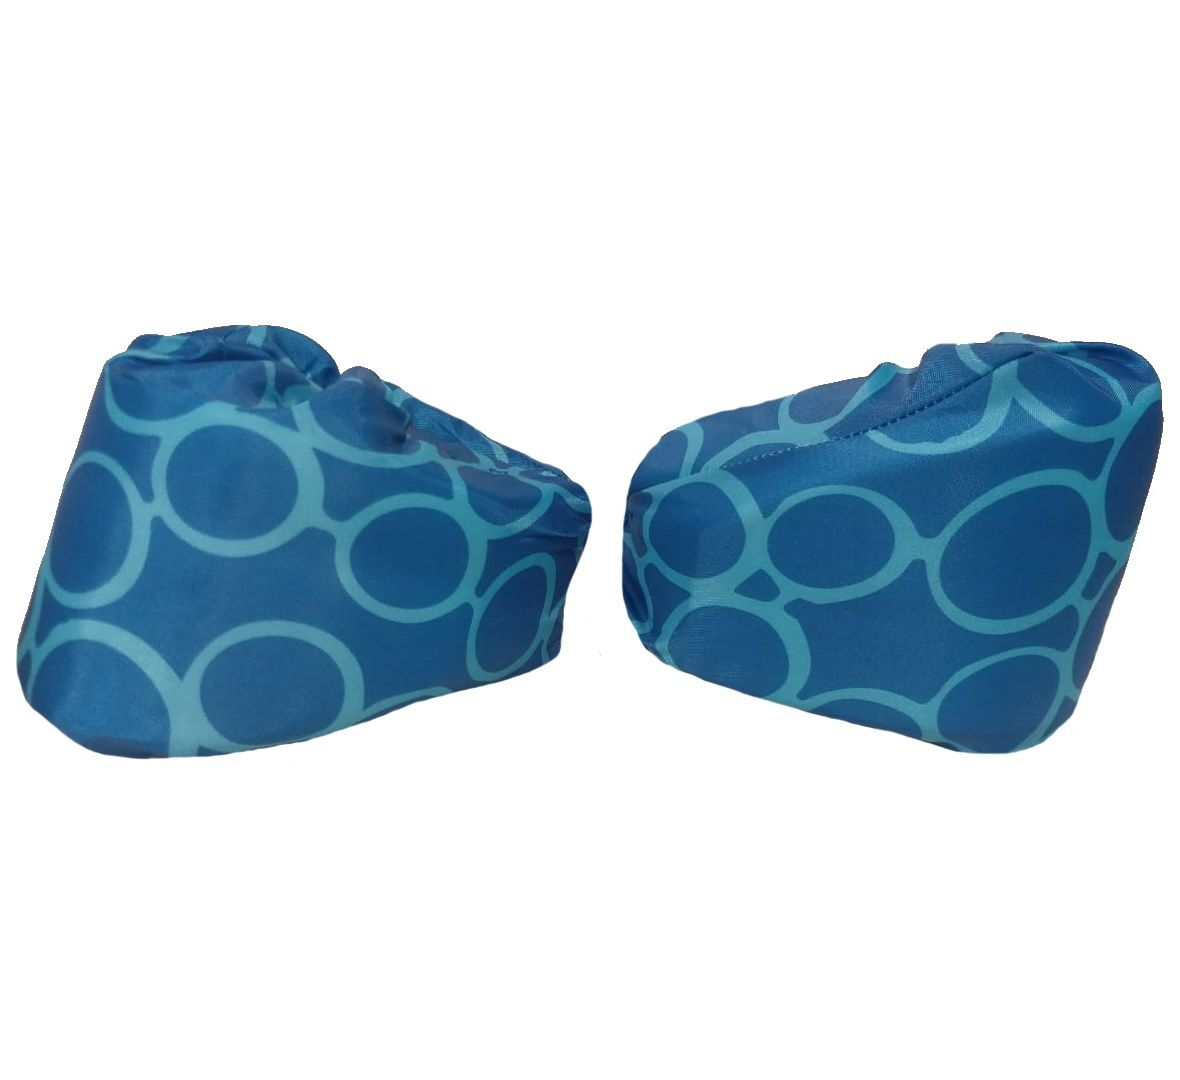 Boia Colete Flutuador Infantil Puddle Jumper Tartaruga - SwimSchool